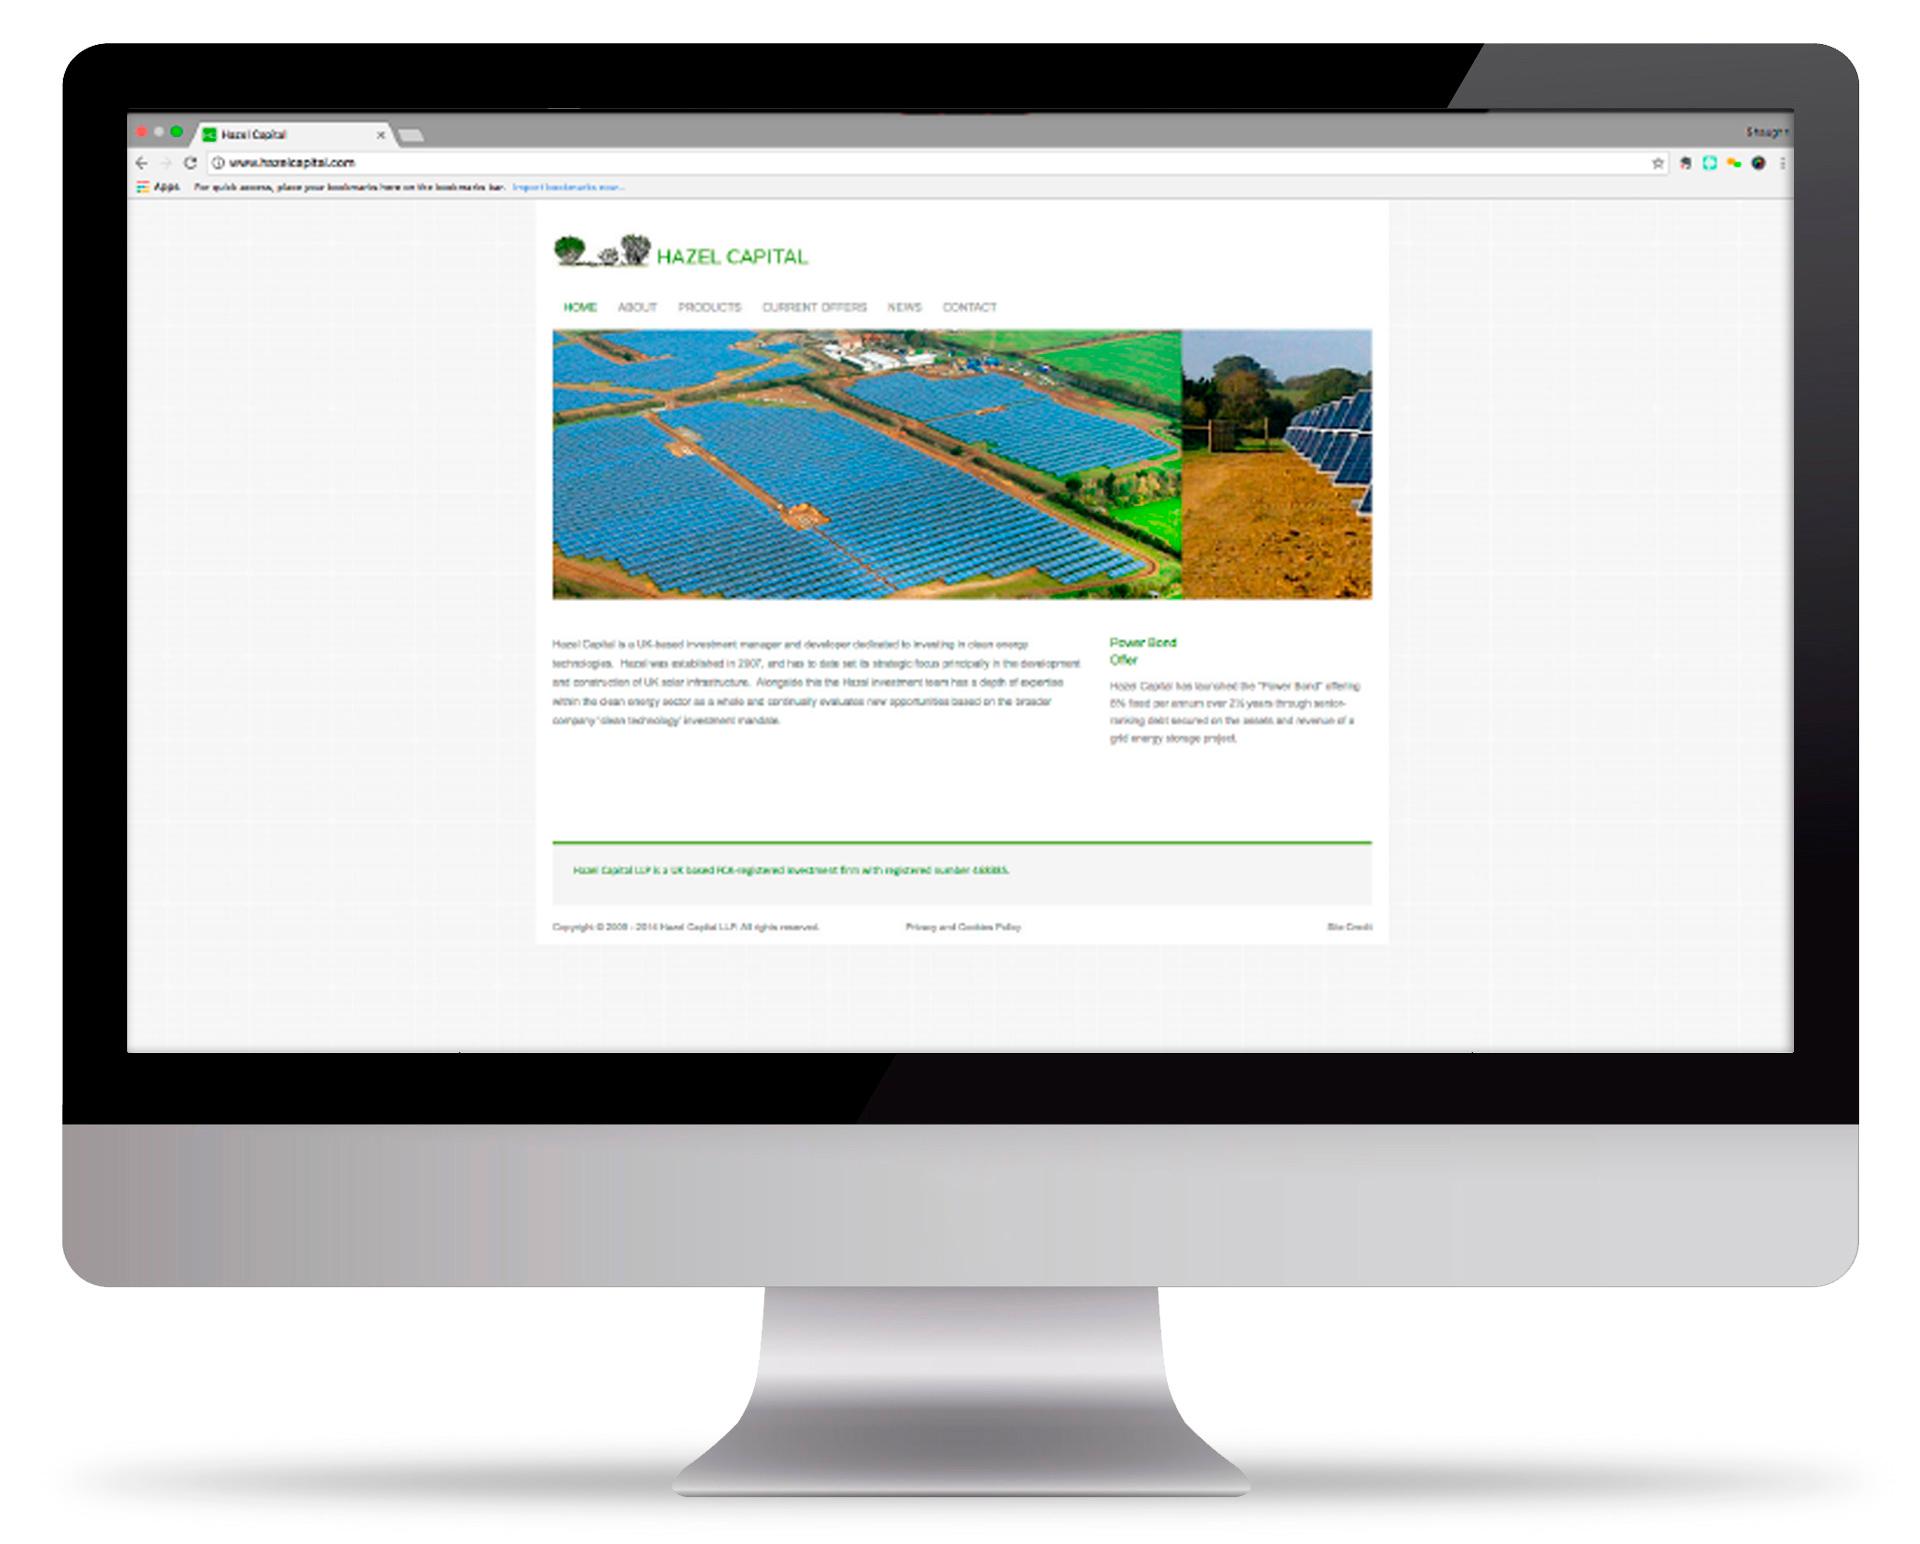 Old Hazel Capital website